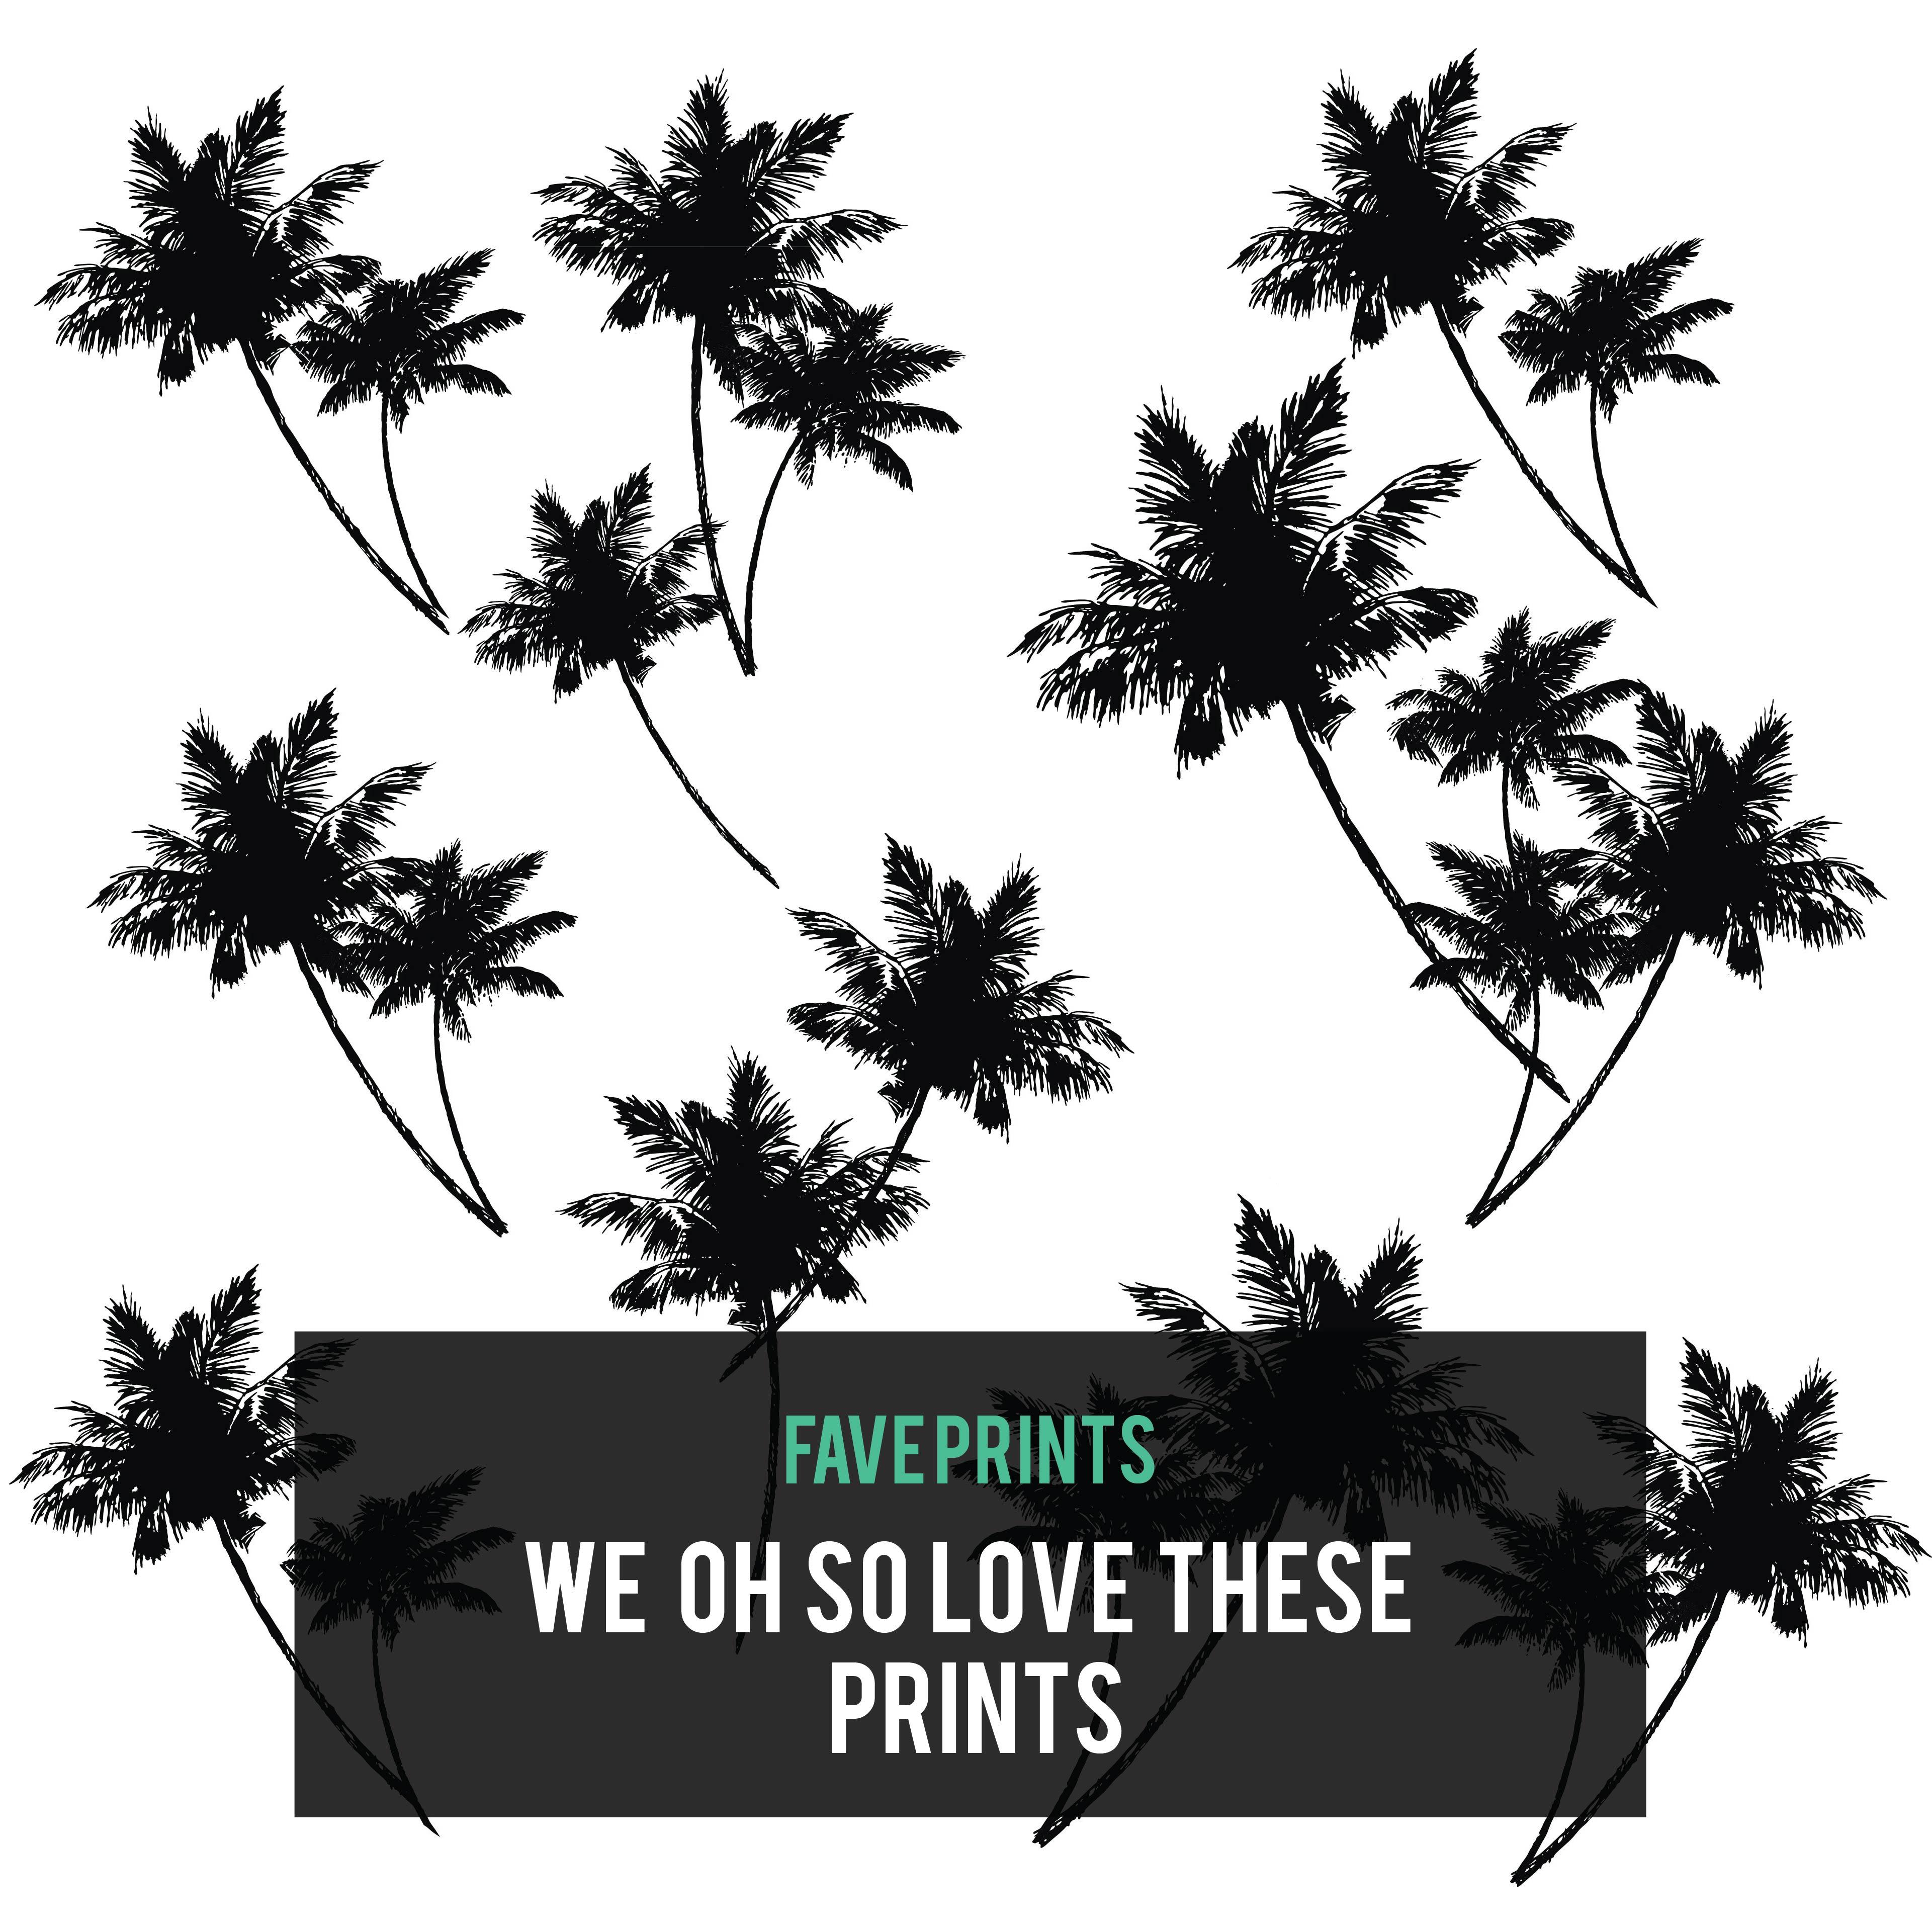 Favourite Prints